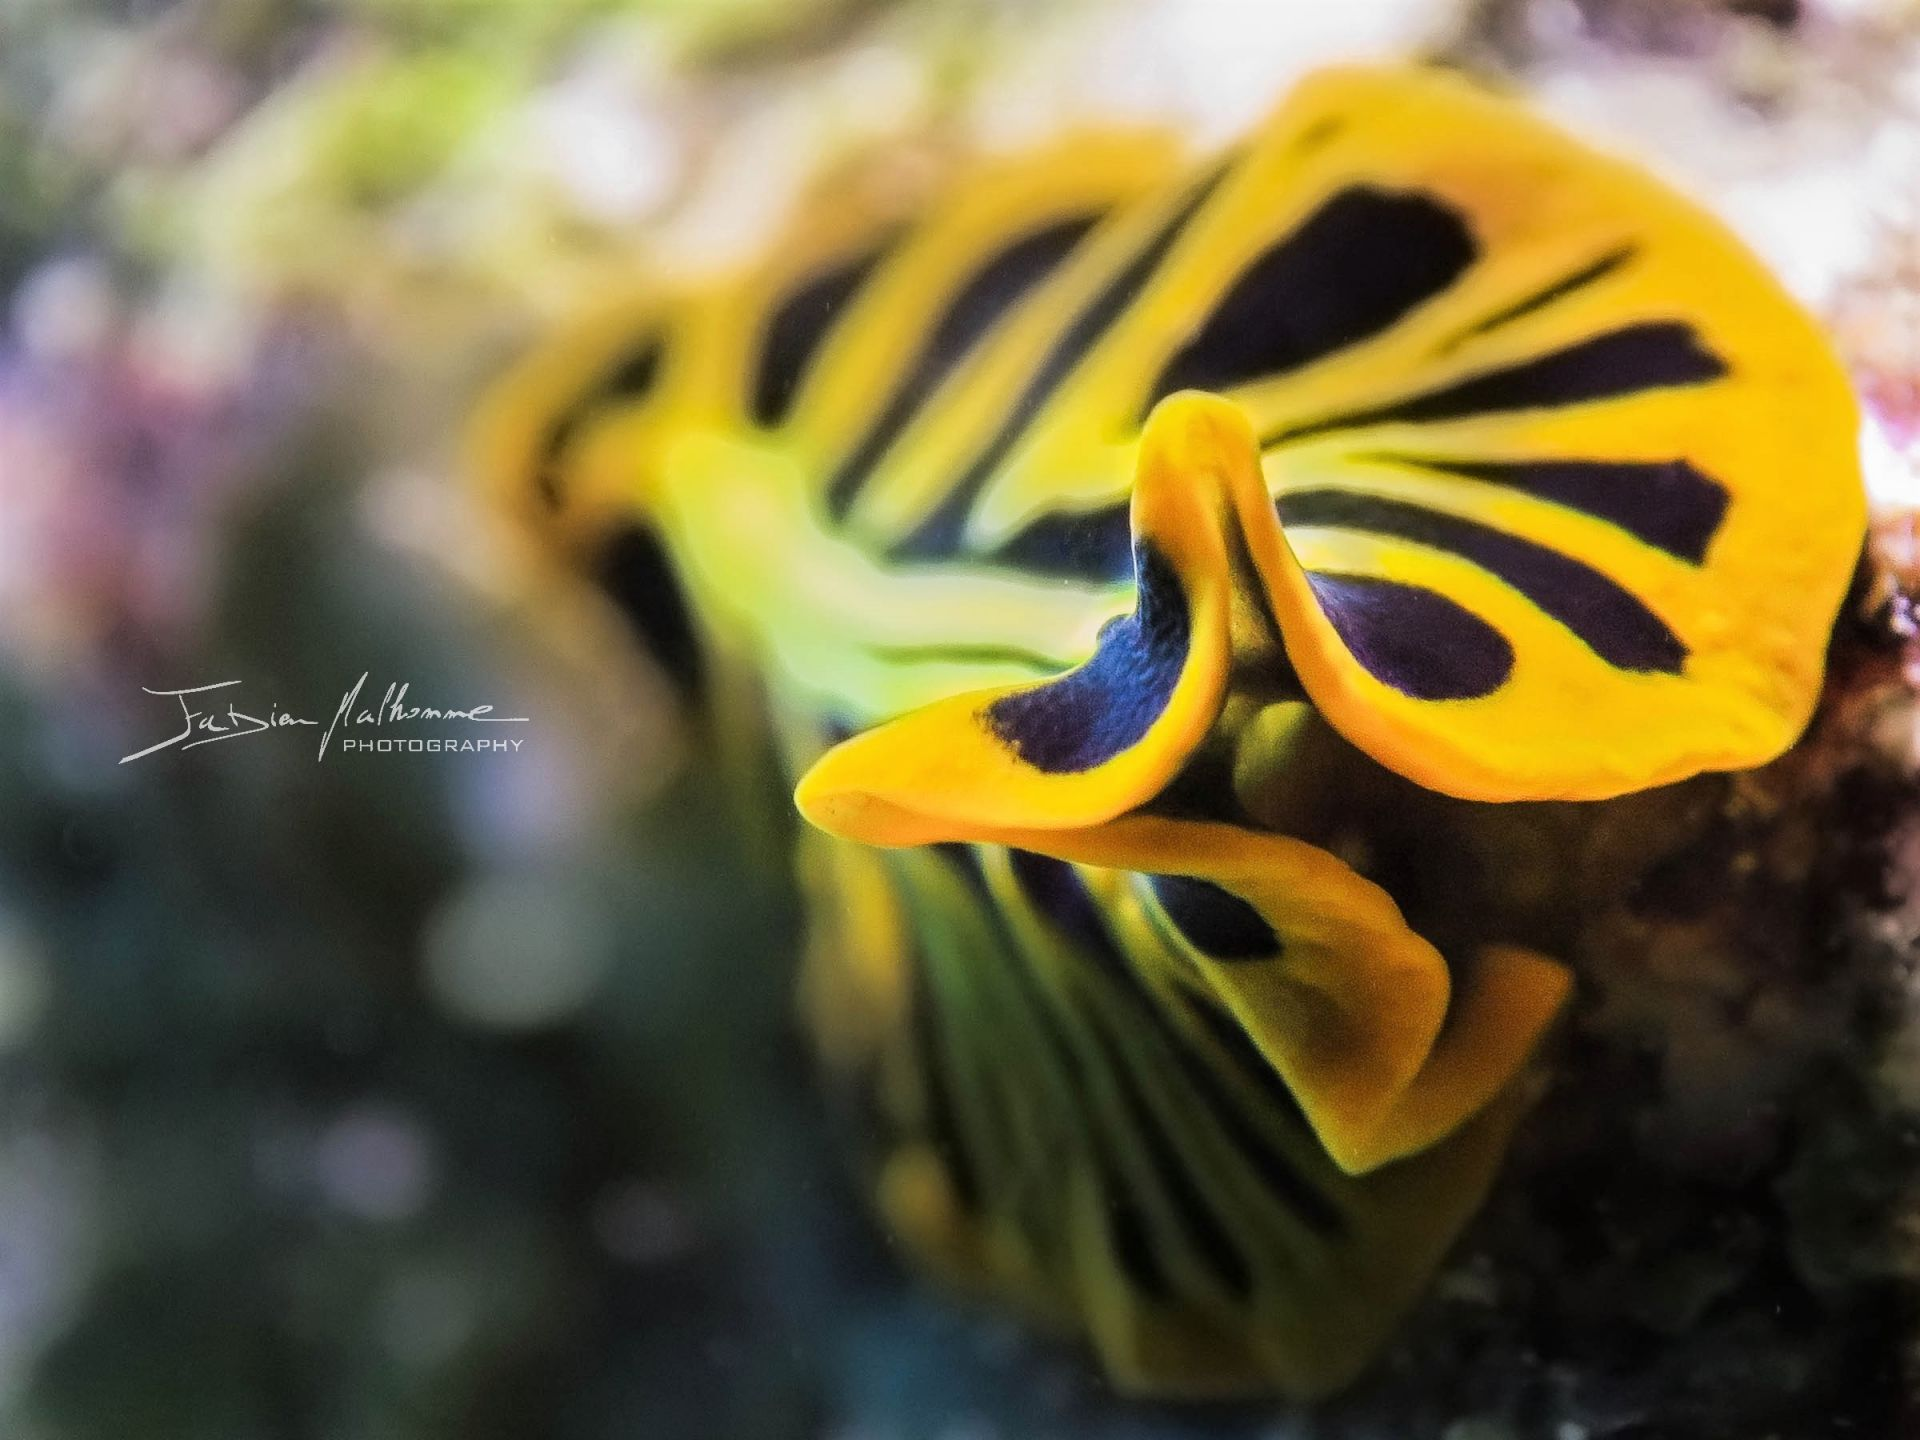 Photographier le monde marin - Ver plat